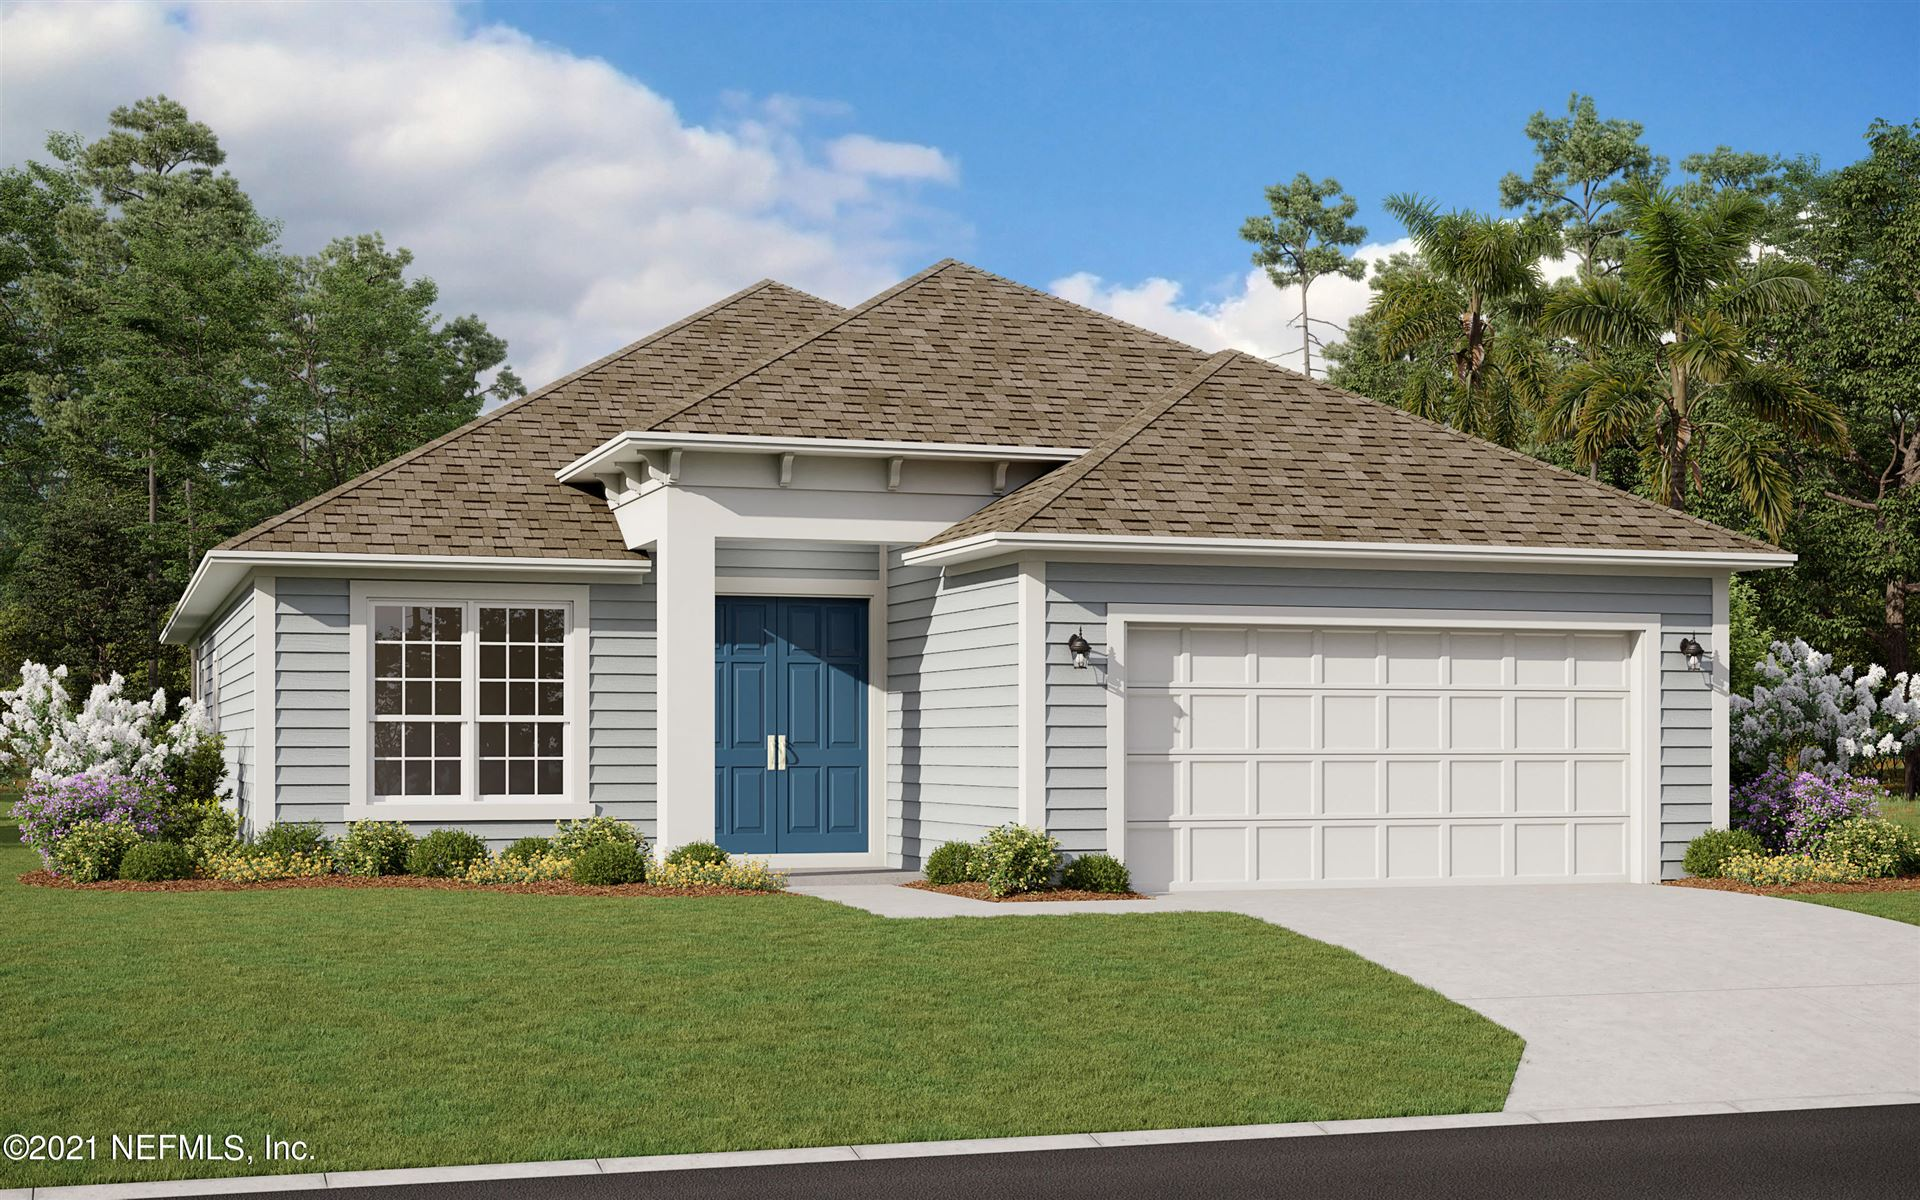 2873 COPPERWOOD AVE #Lot No: 062, Orange Park, FL 32073 - MLS#: 1097564